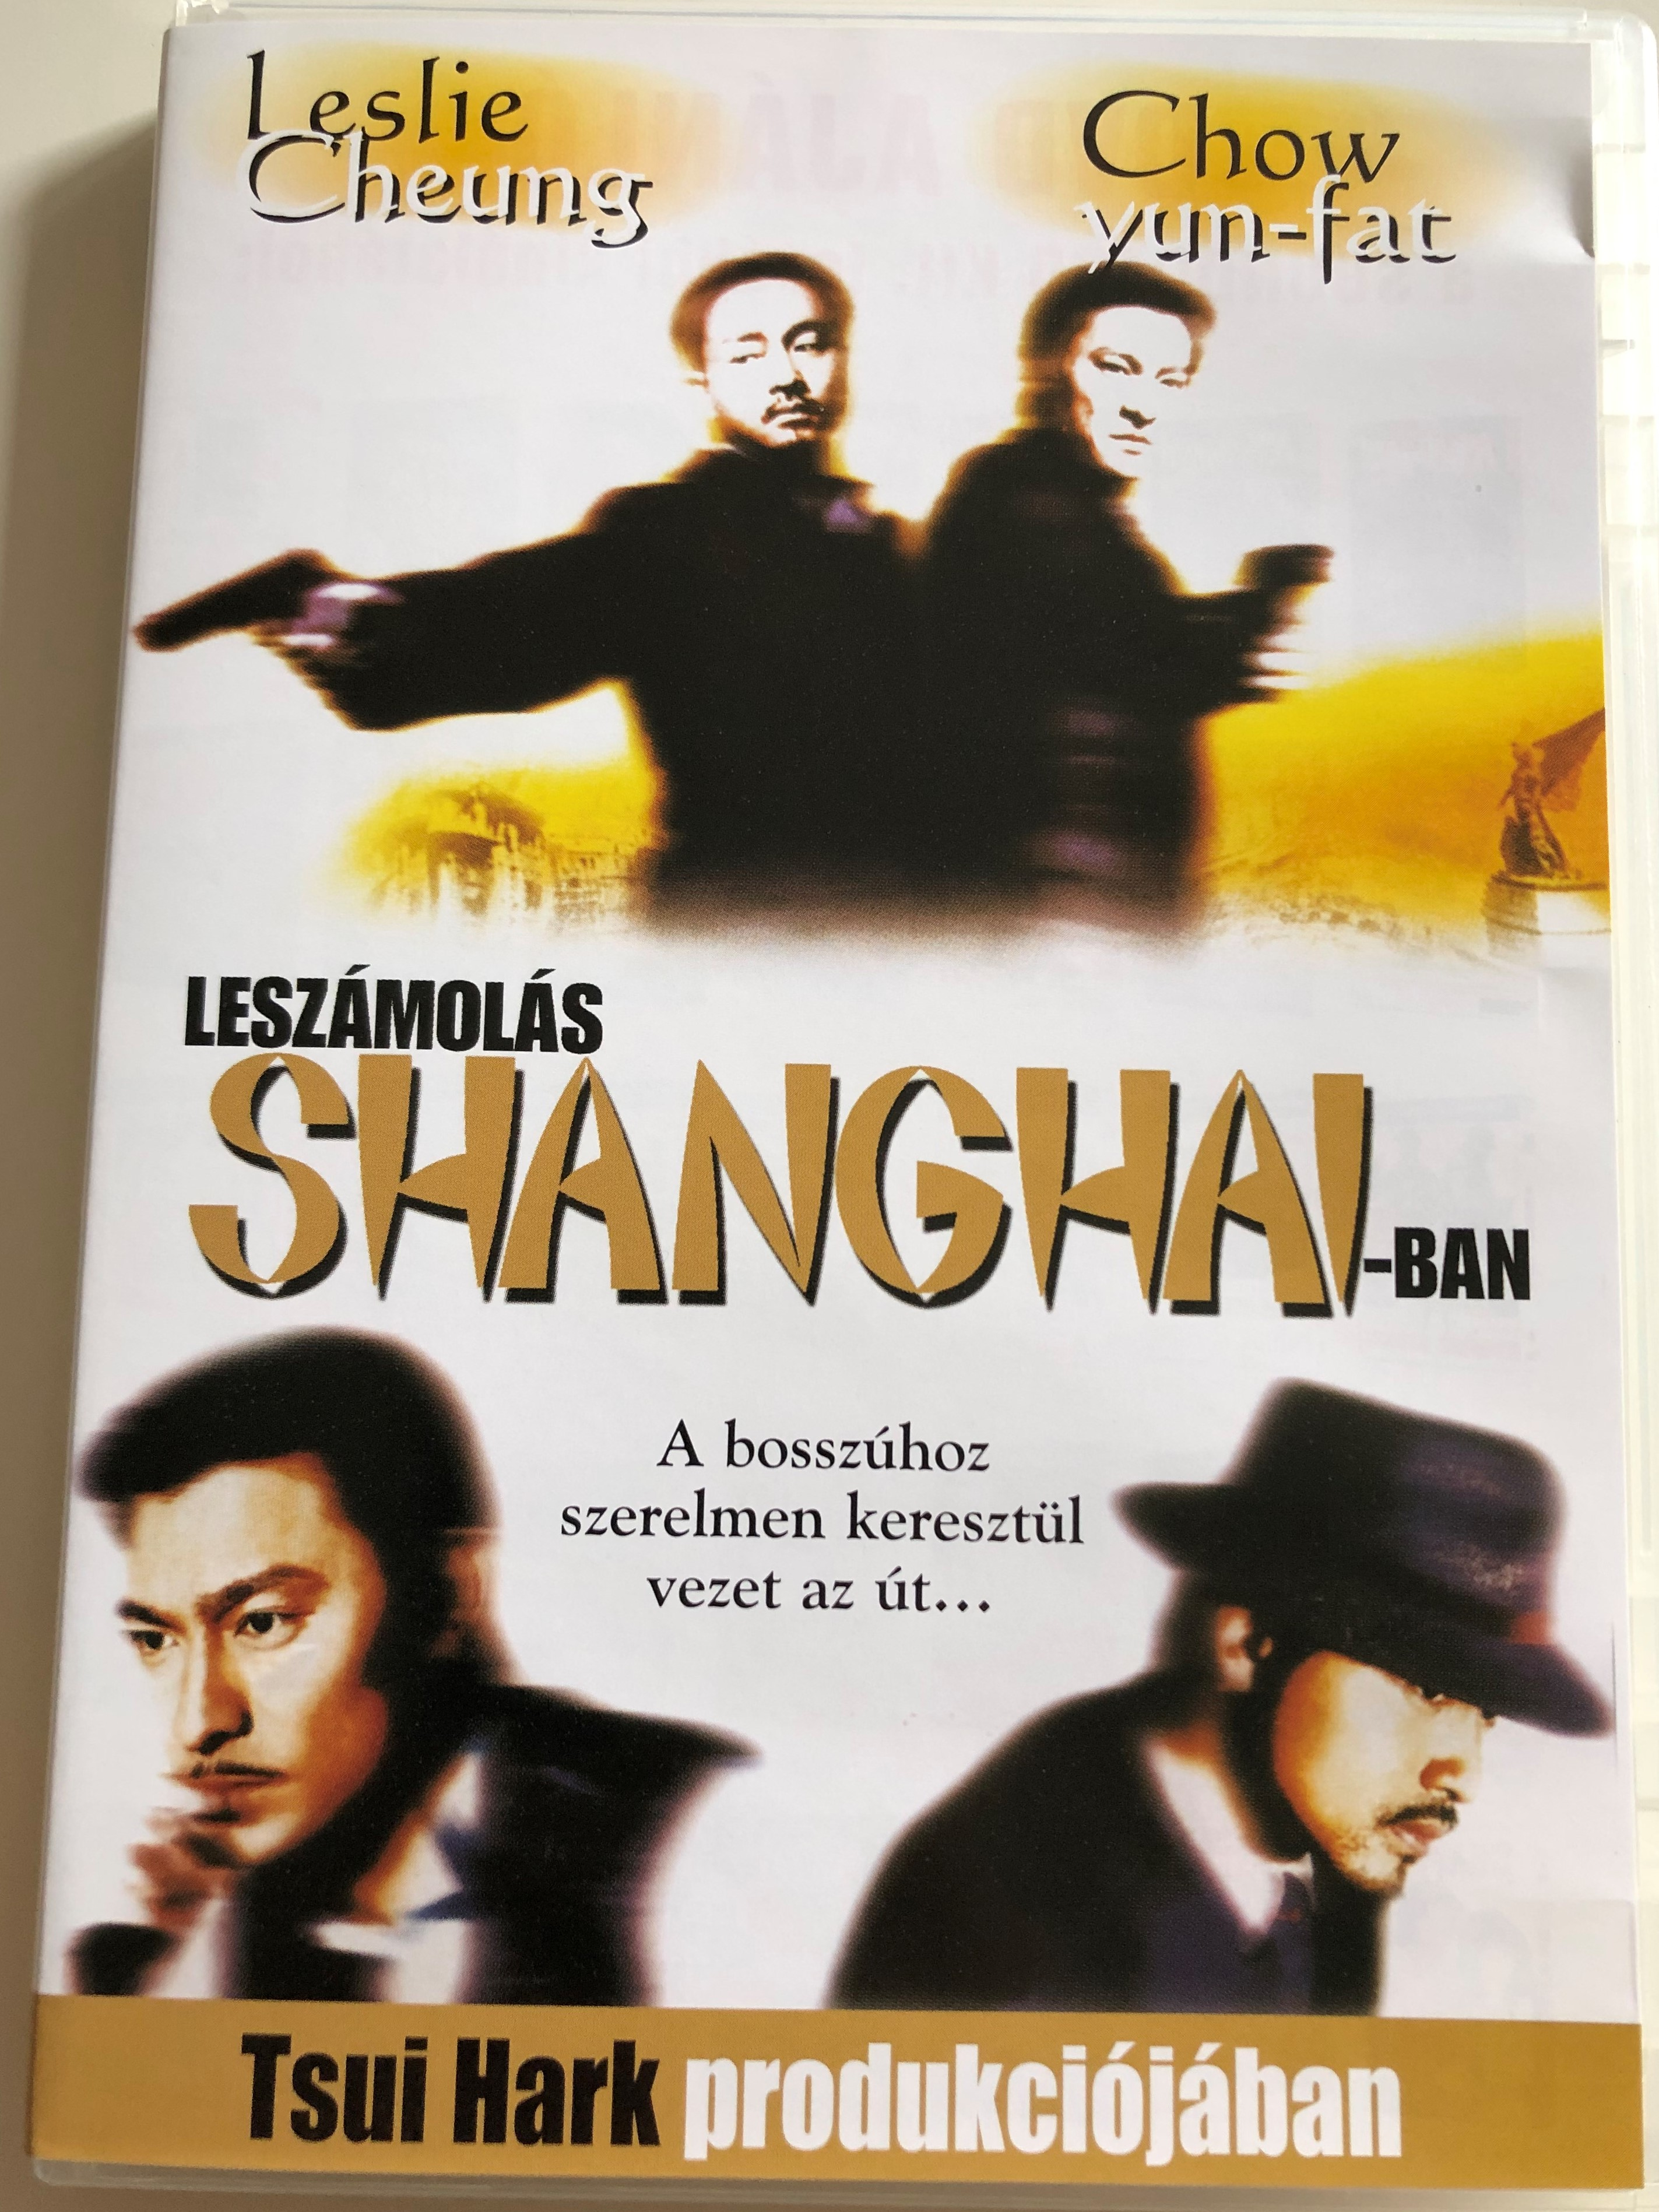 shanghai-grand-dvd-1996-lesz-mol-s-sanghajban-directed-by-man-kit-poon-starring-andy-lau-leslie-cheung-ning-jing-san-seong-hoi-taan-1-.jpg